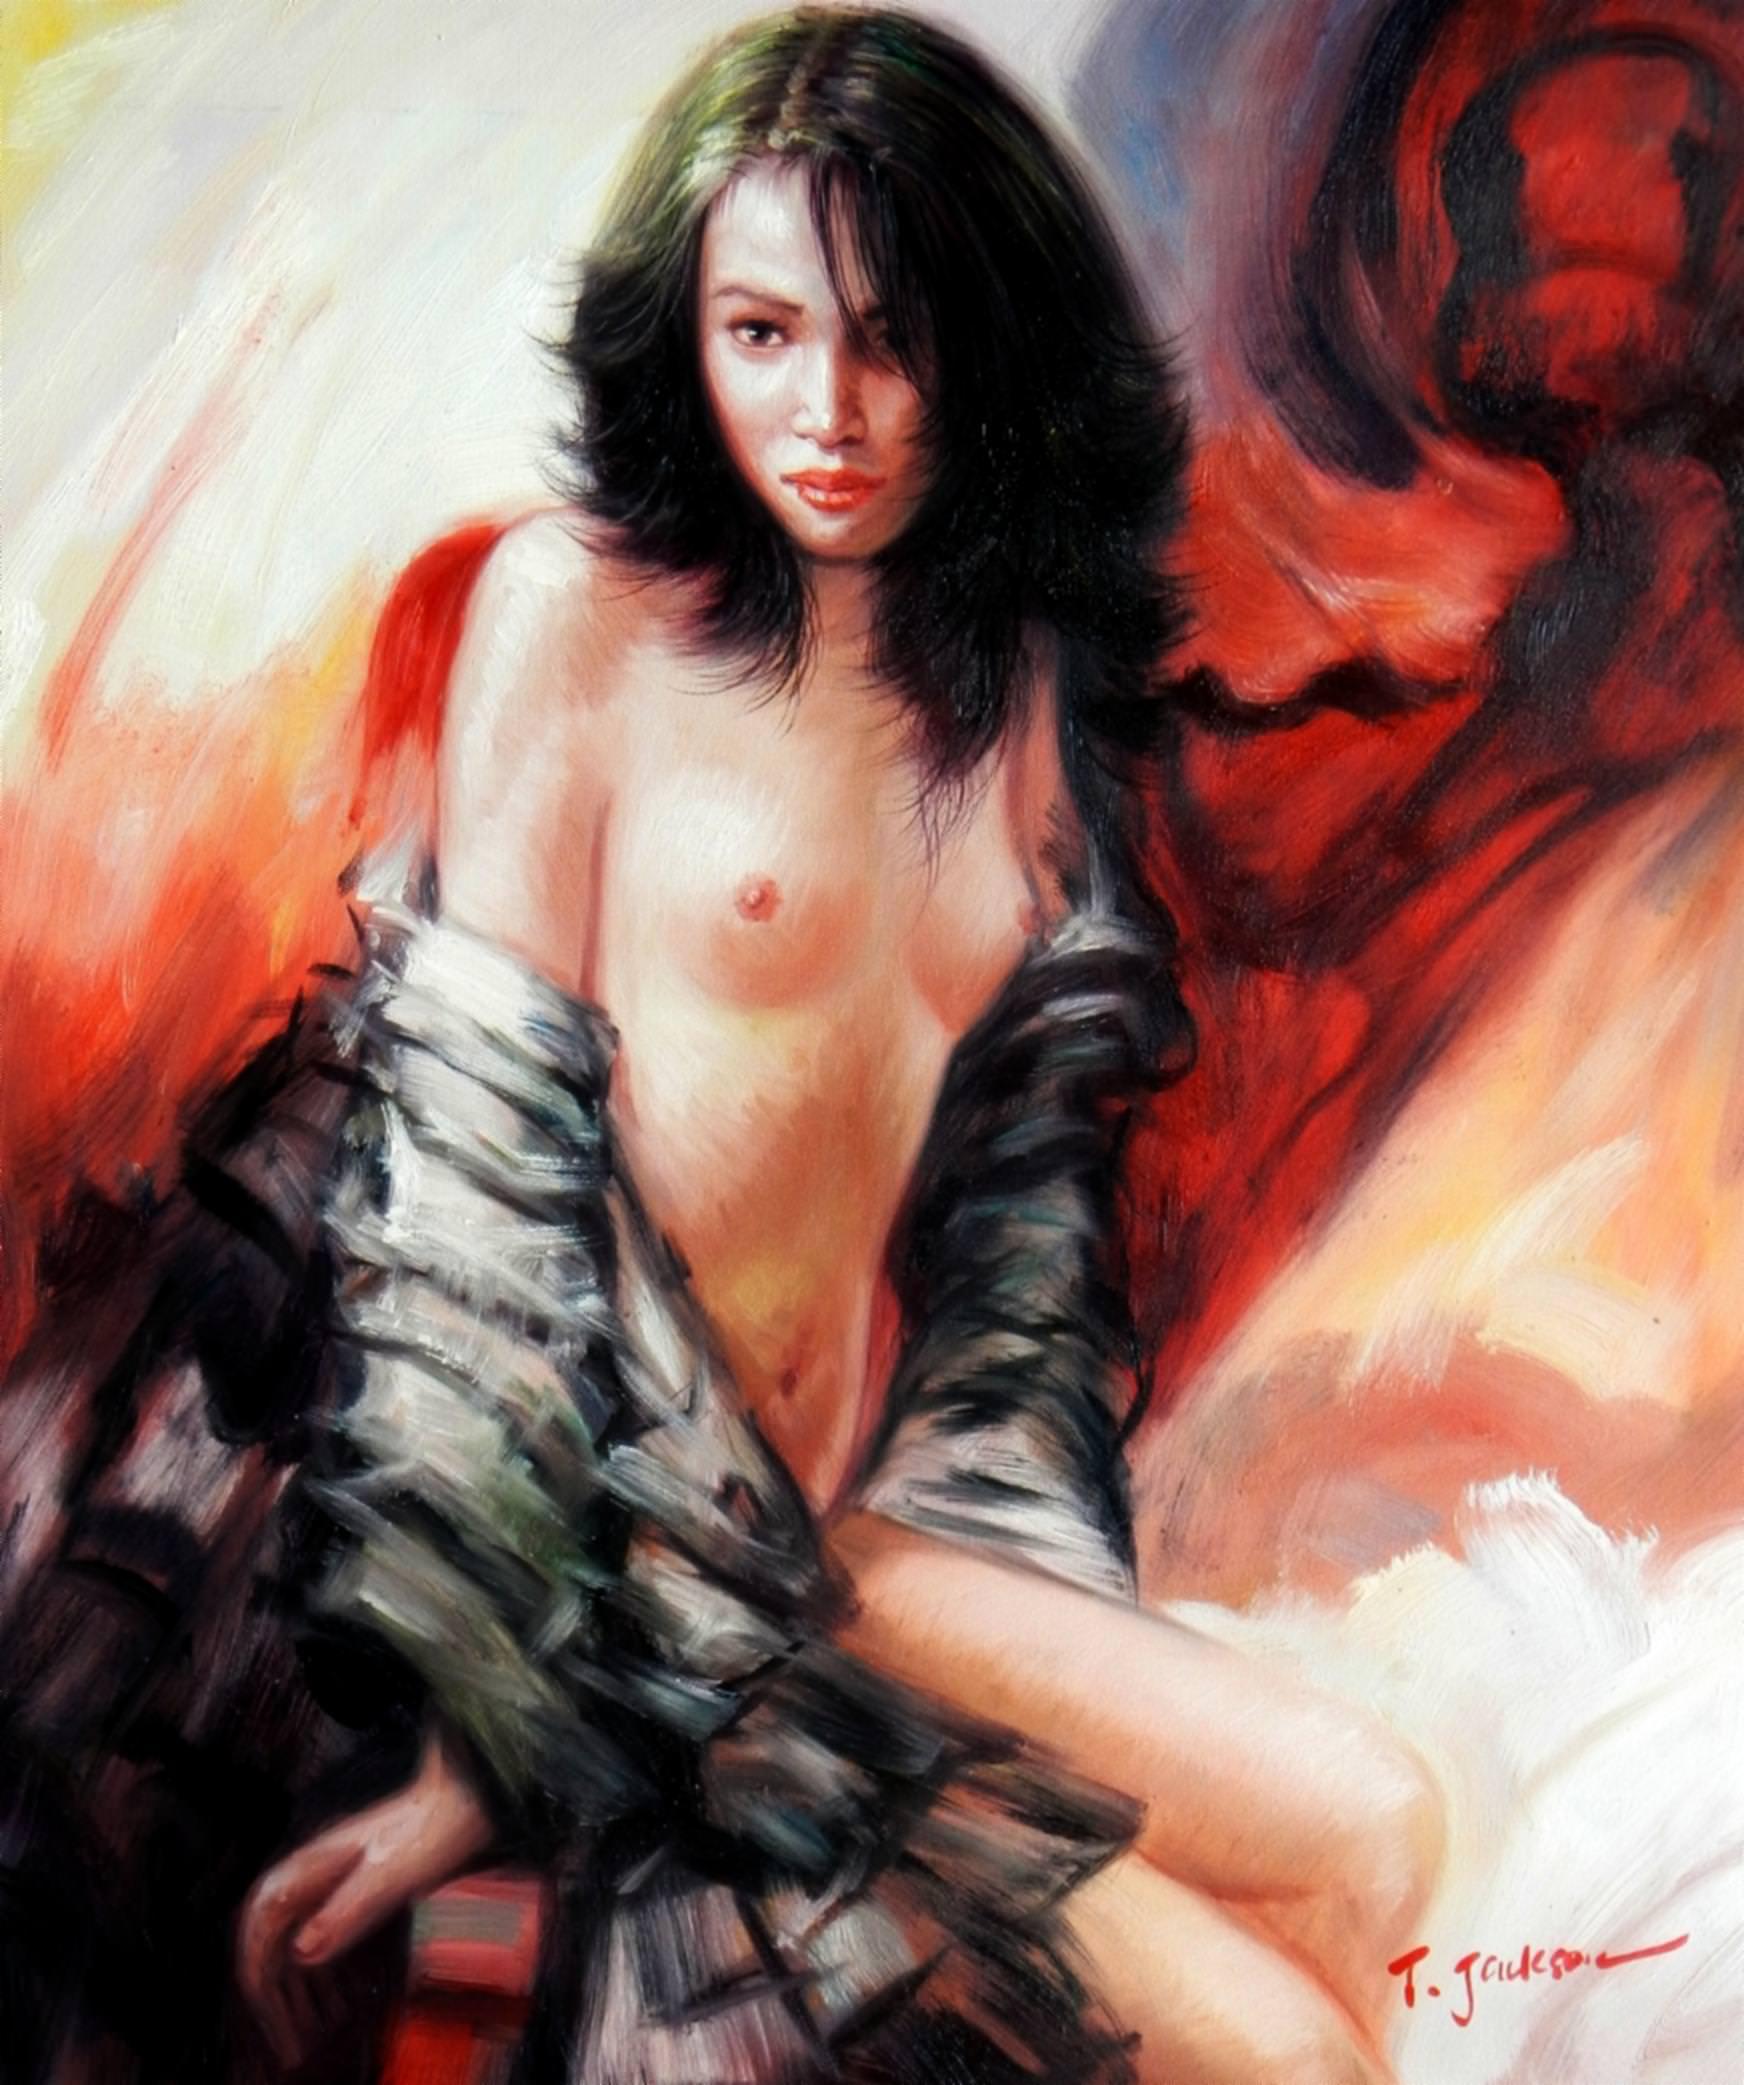 Modern Art - Augenblick Erotik Akt c92863 50x60cm exquisites Gemälde